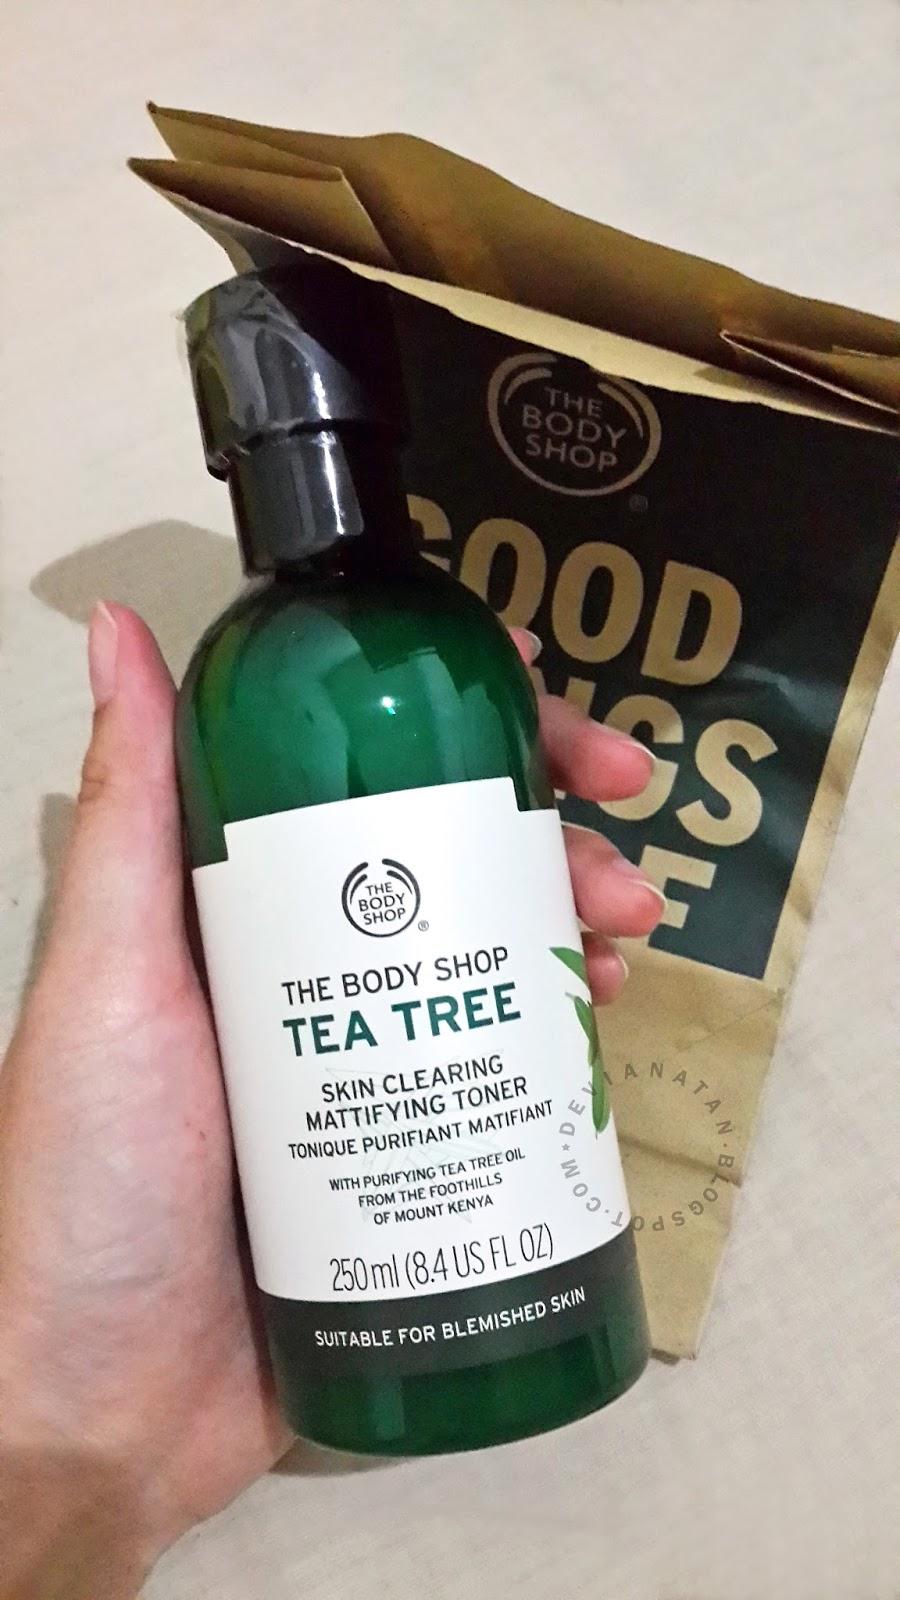 REVIEW The Body Shop Tea Tree Skin Clearing Mattifying